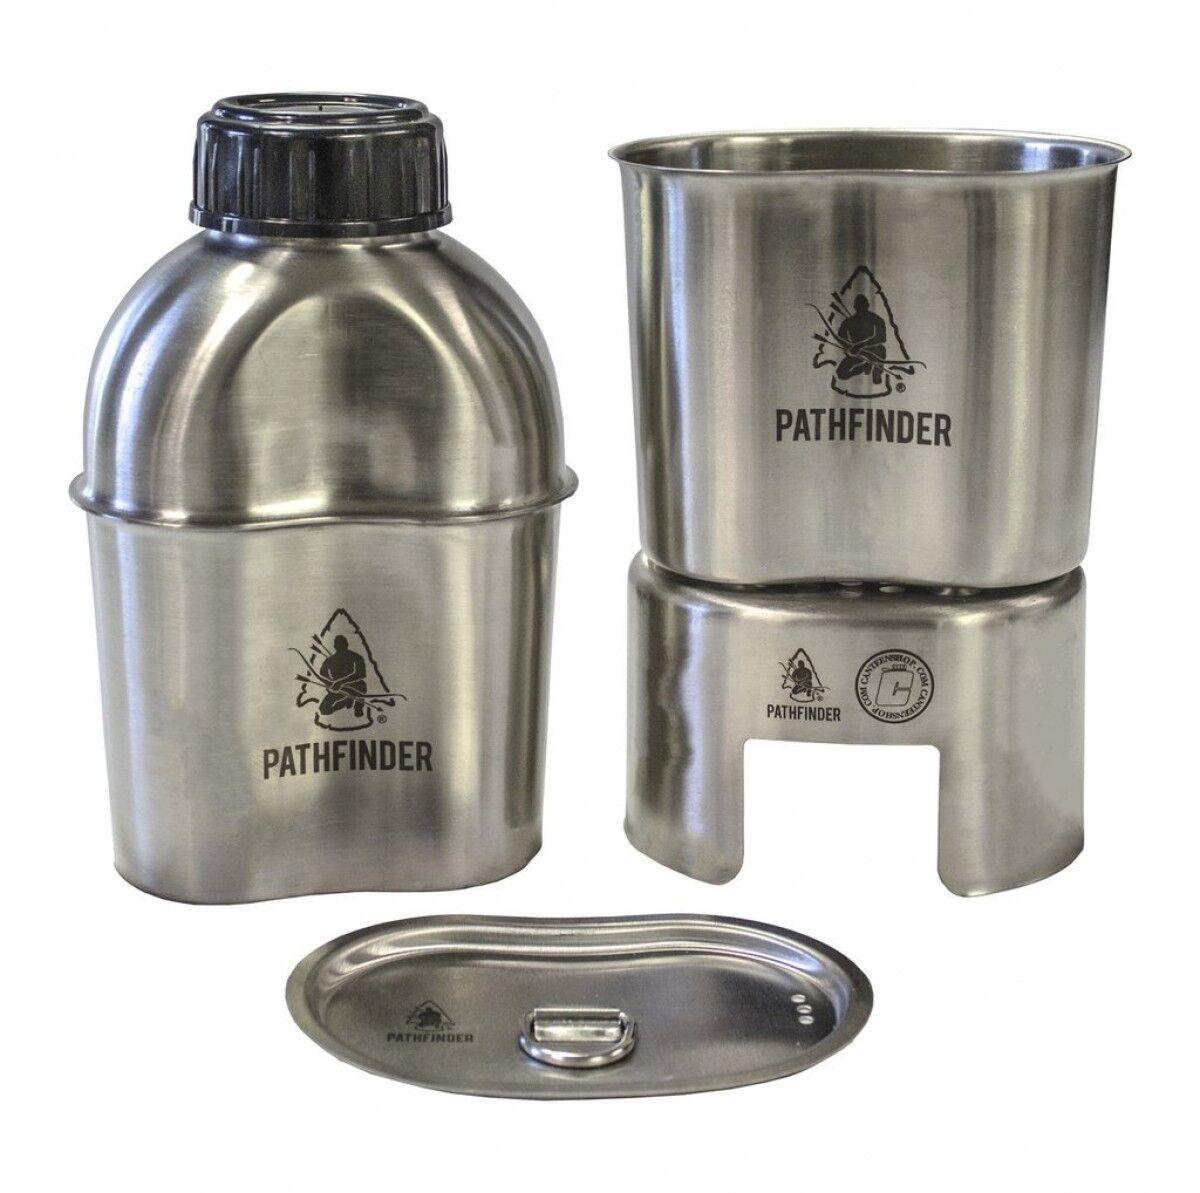 Pathfinder Edelstahl Canteen Cooking Set beinhaltet Cup, Herd, Canteen